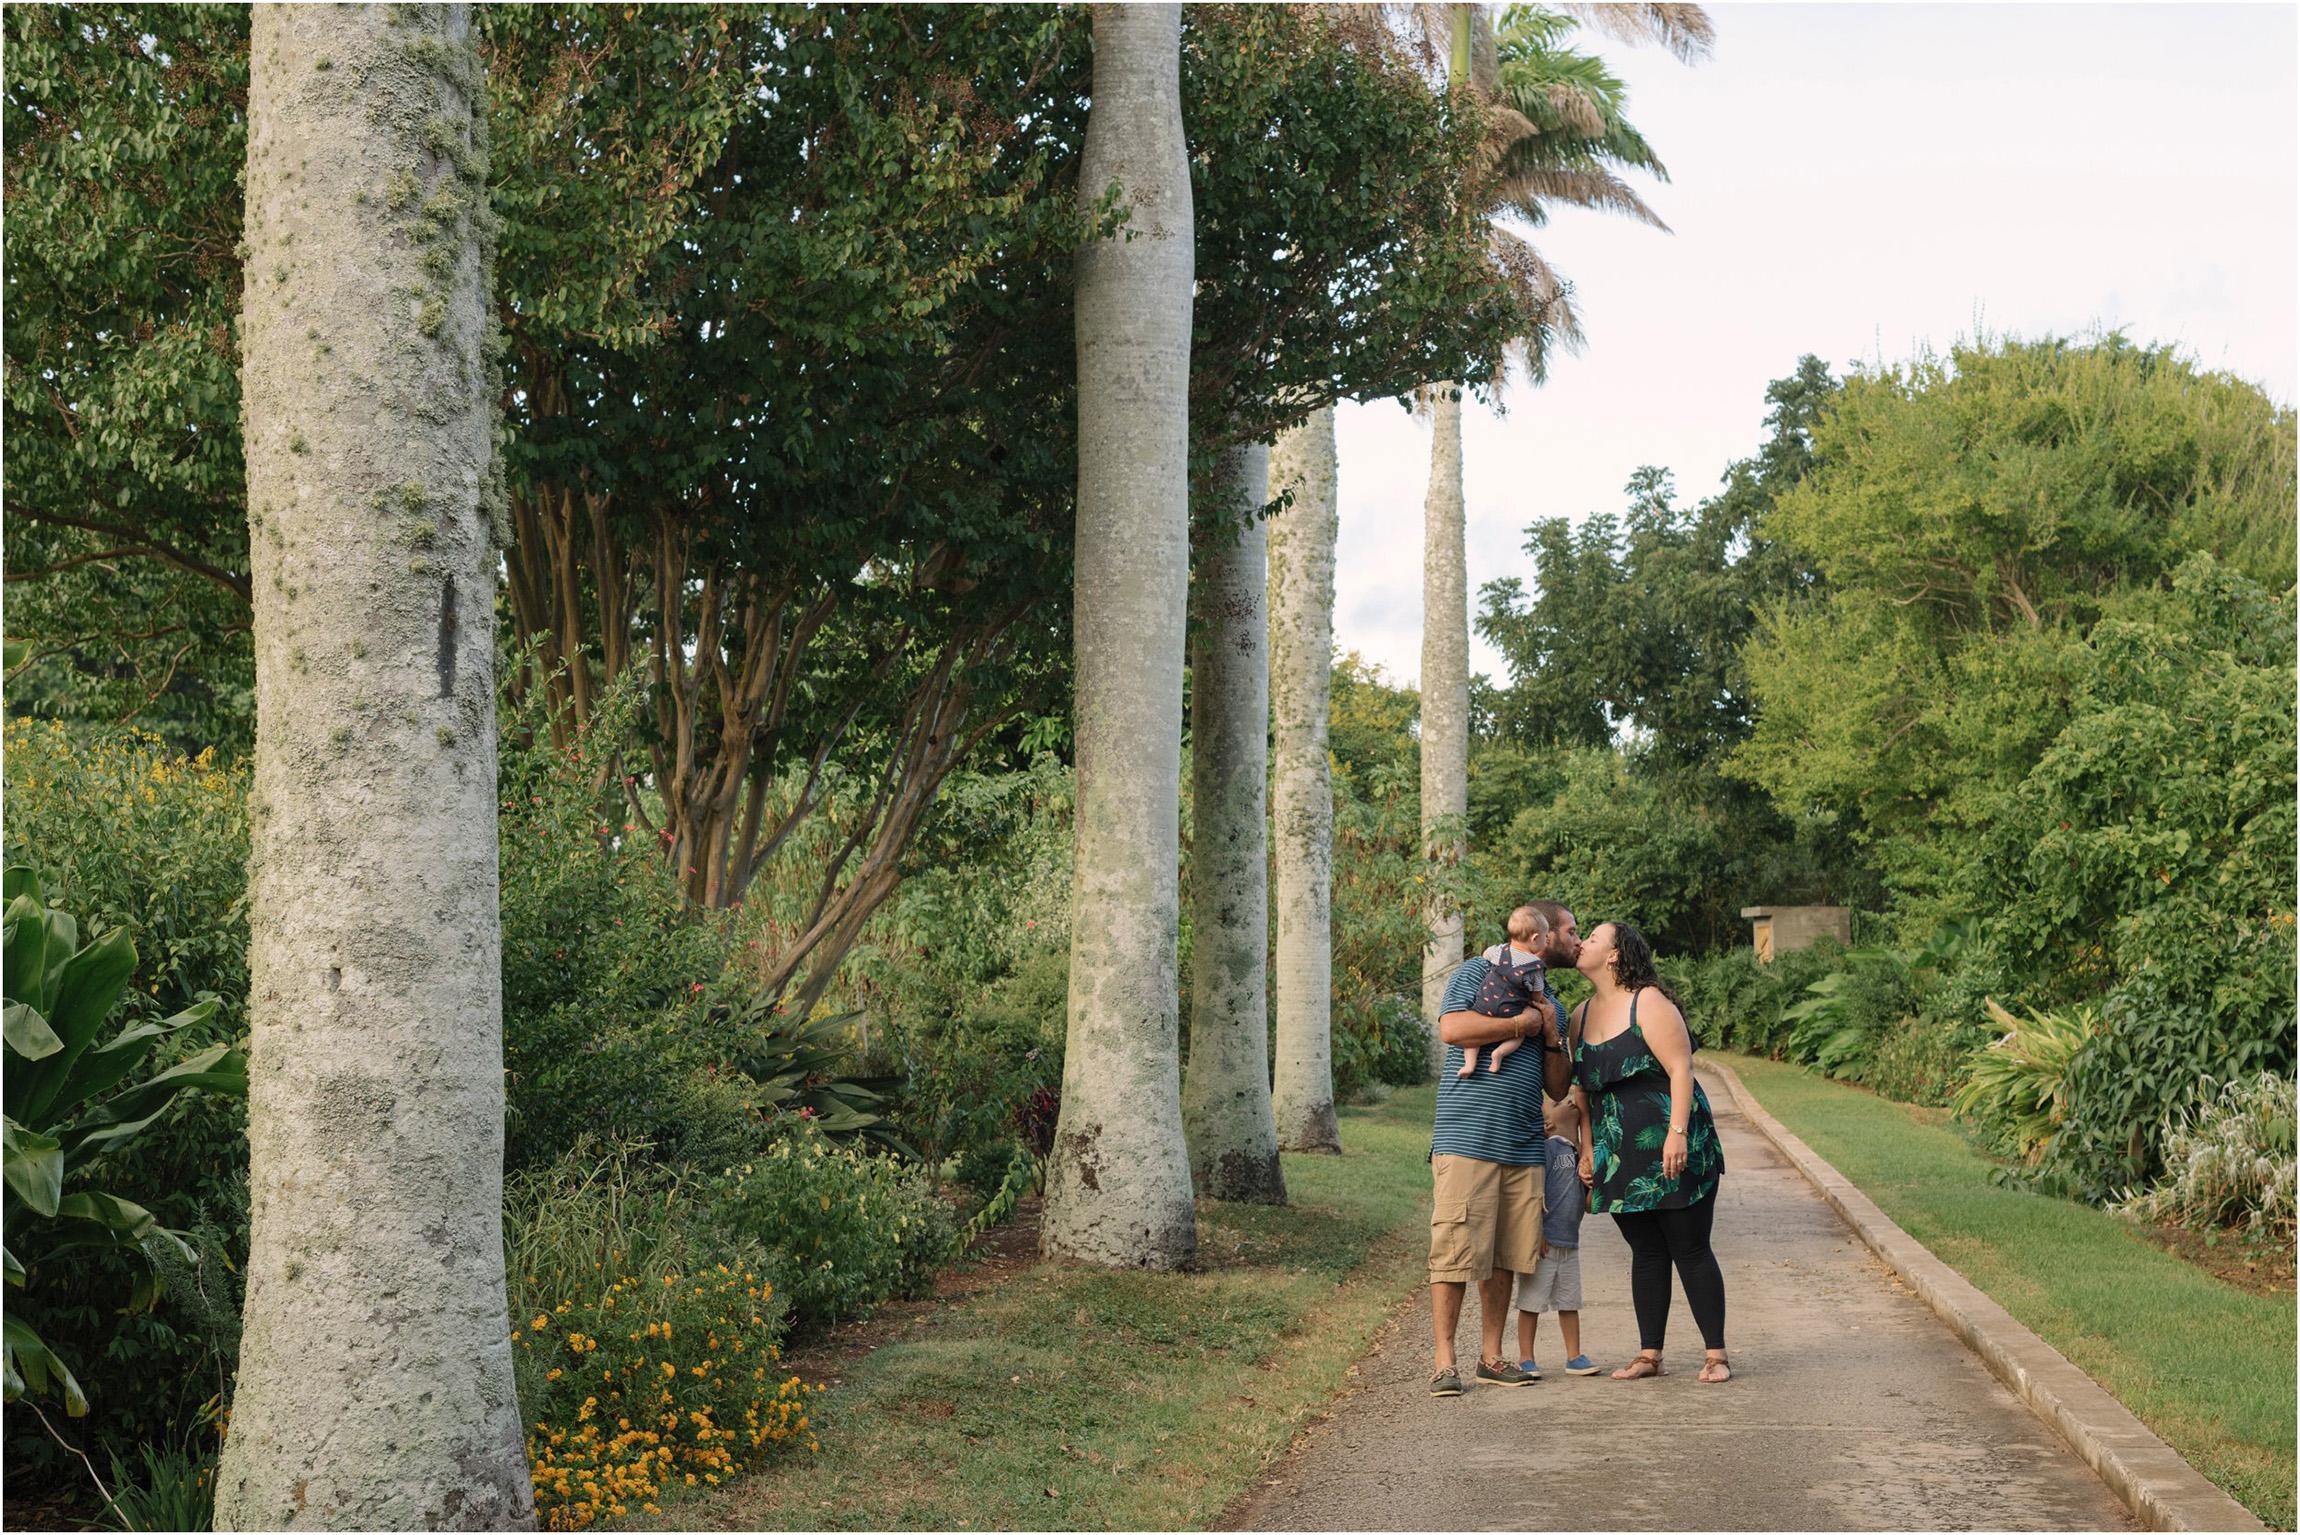 ©FianderFoto_Bermuda Family Photogarpher_Botanical Gardens_Amaro_009.jpg